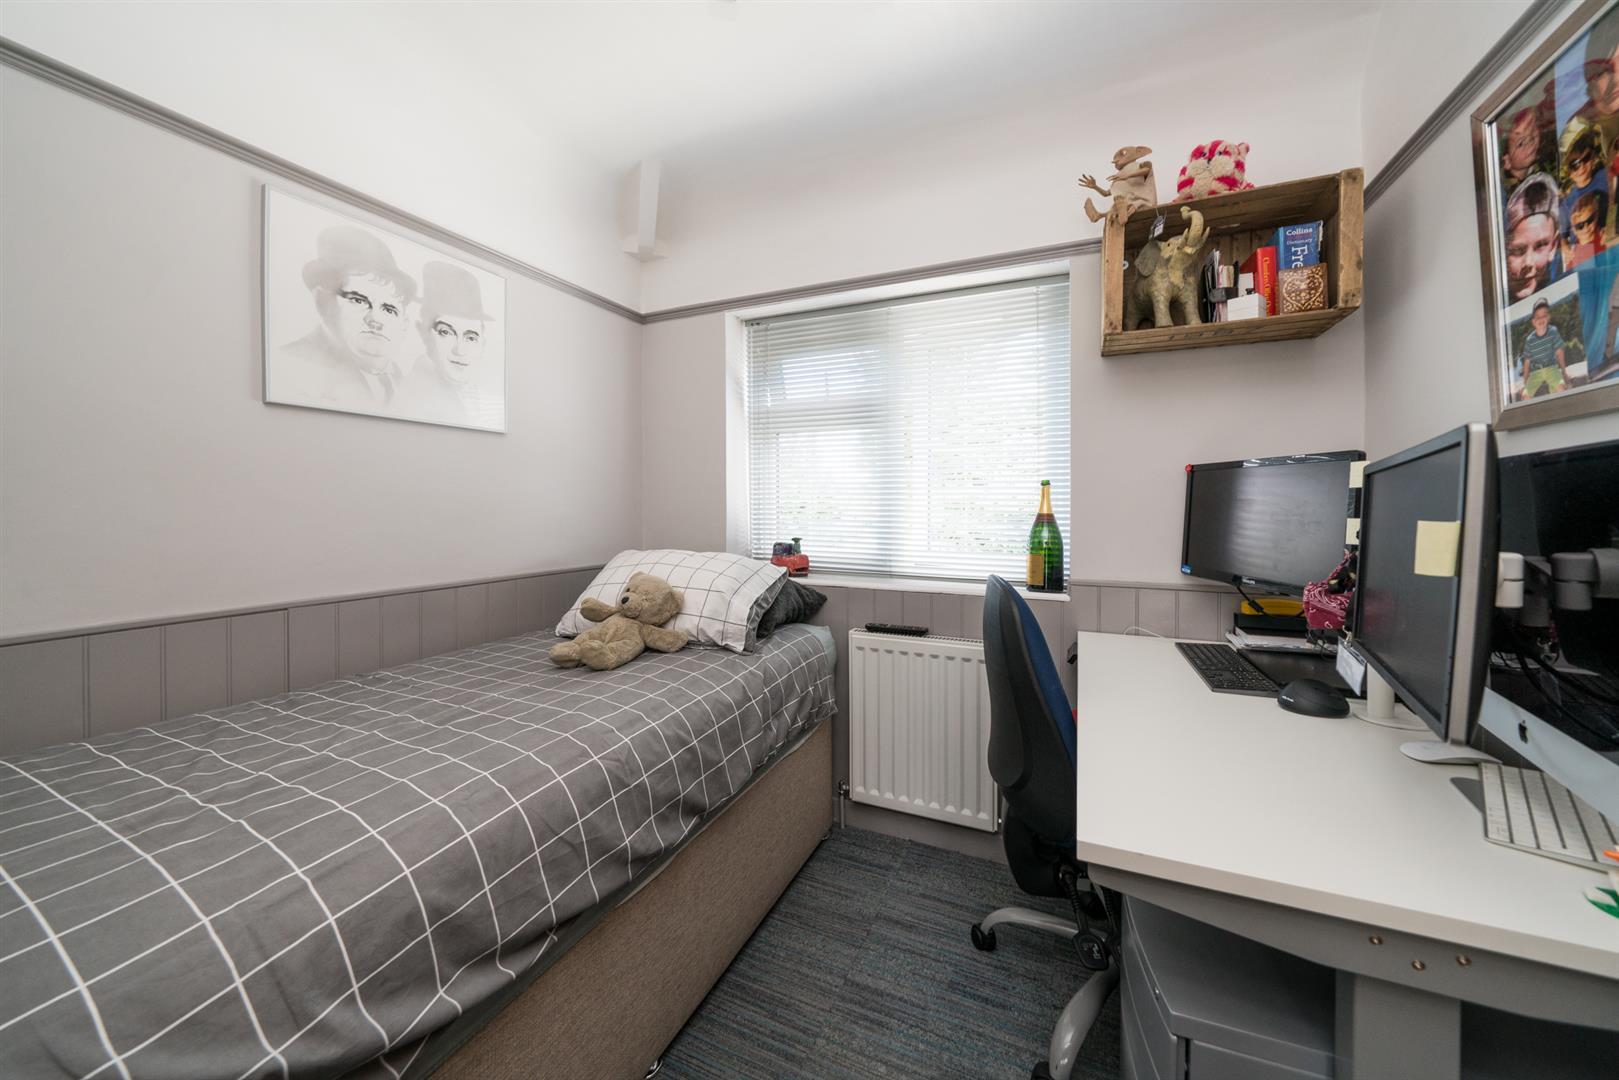 12-Ranelagh-Road-1018 - bed 3.jpg